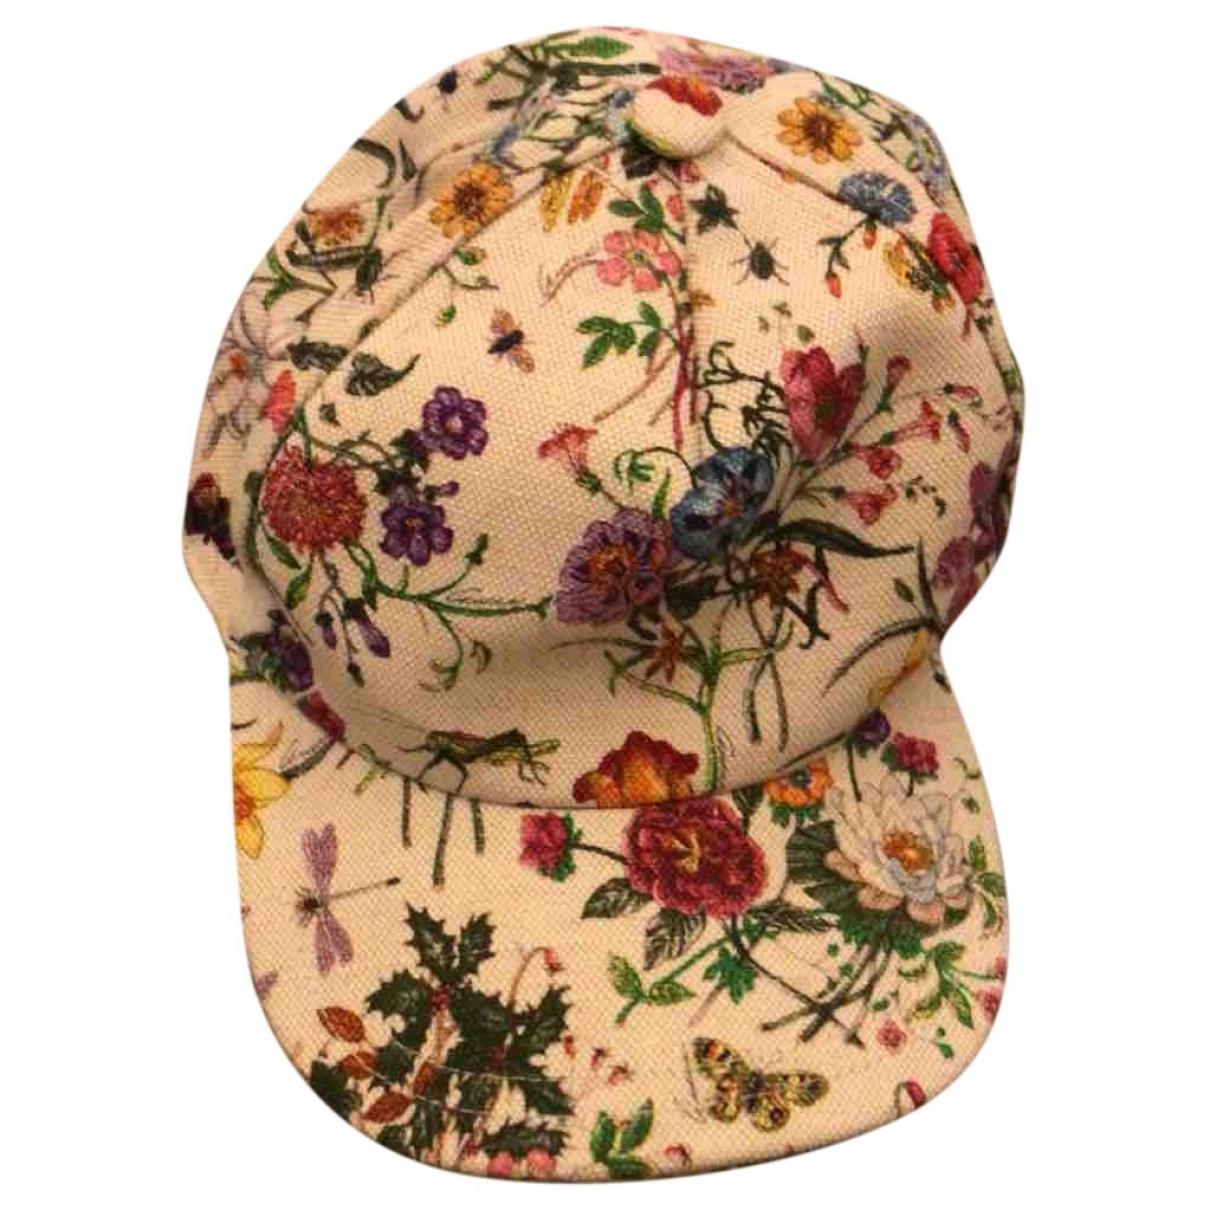 Gucci \N Multicolour Cotton hat for Women S International